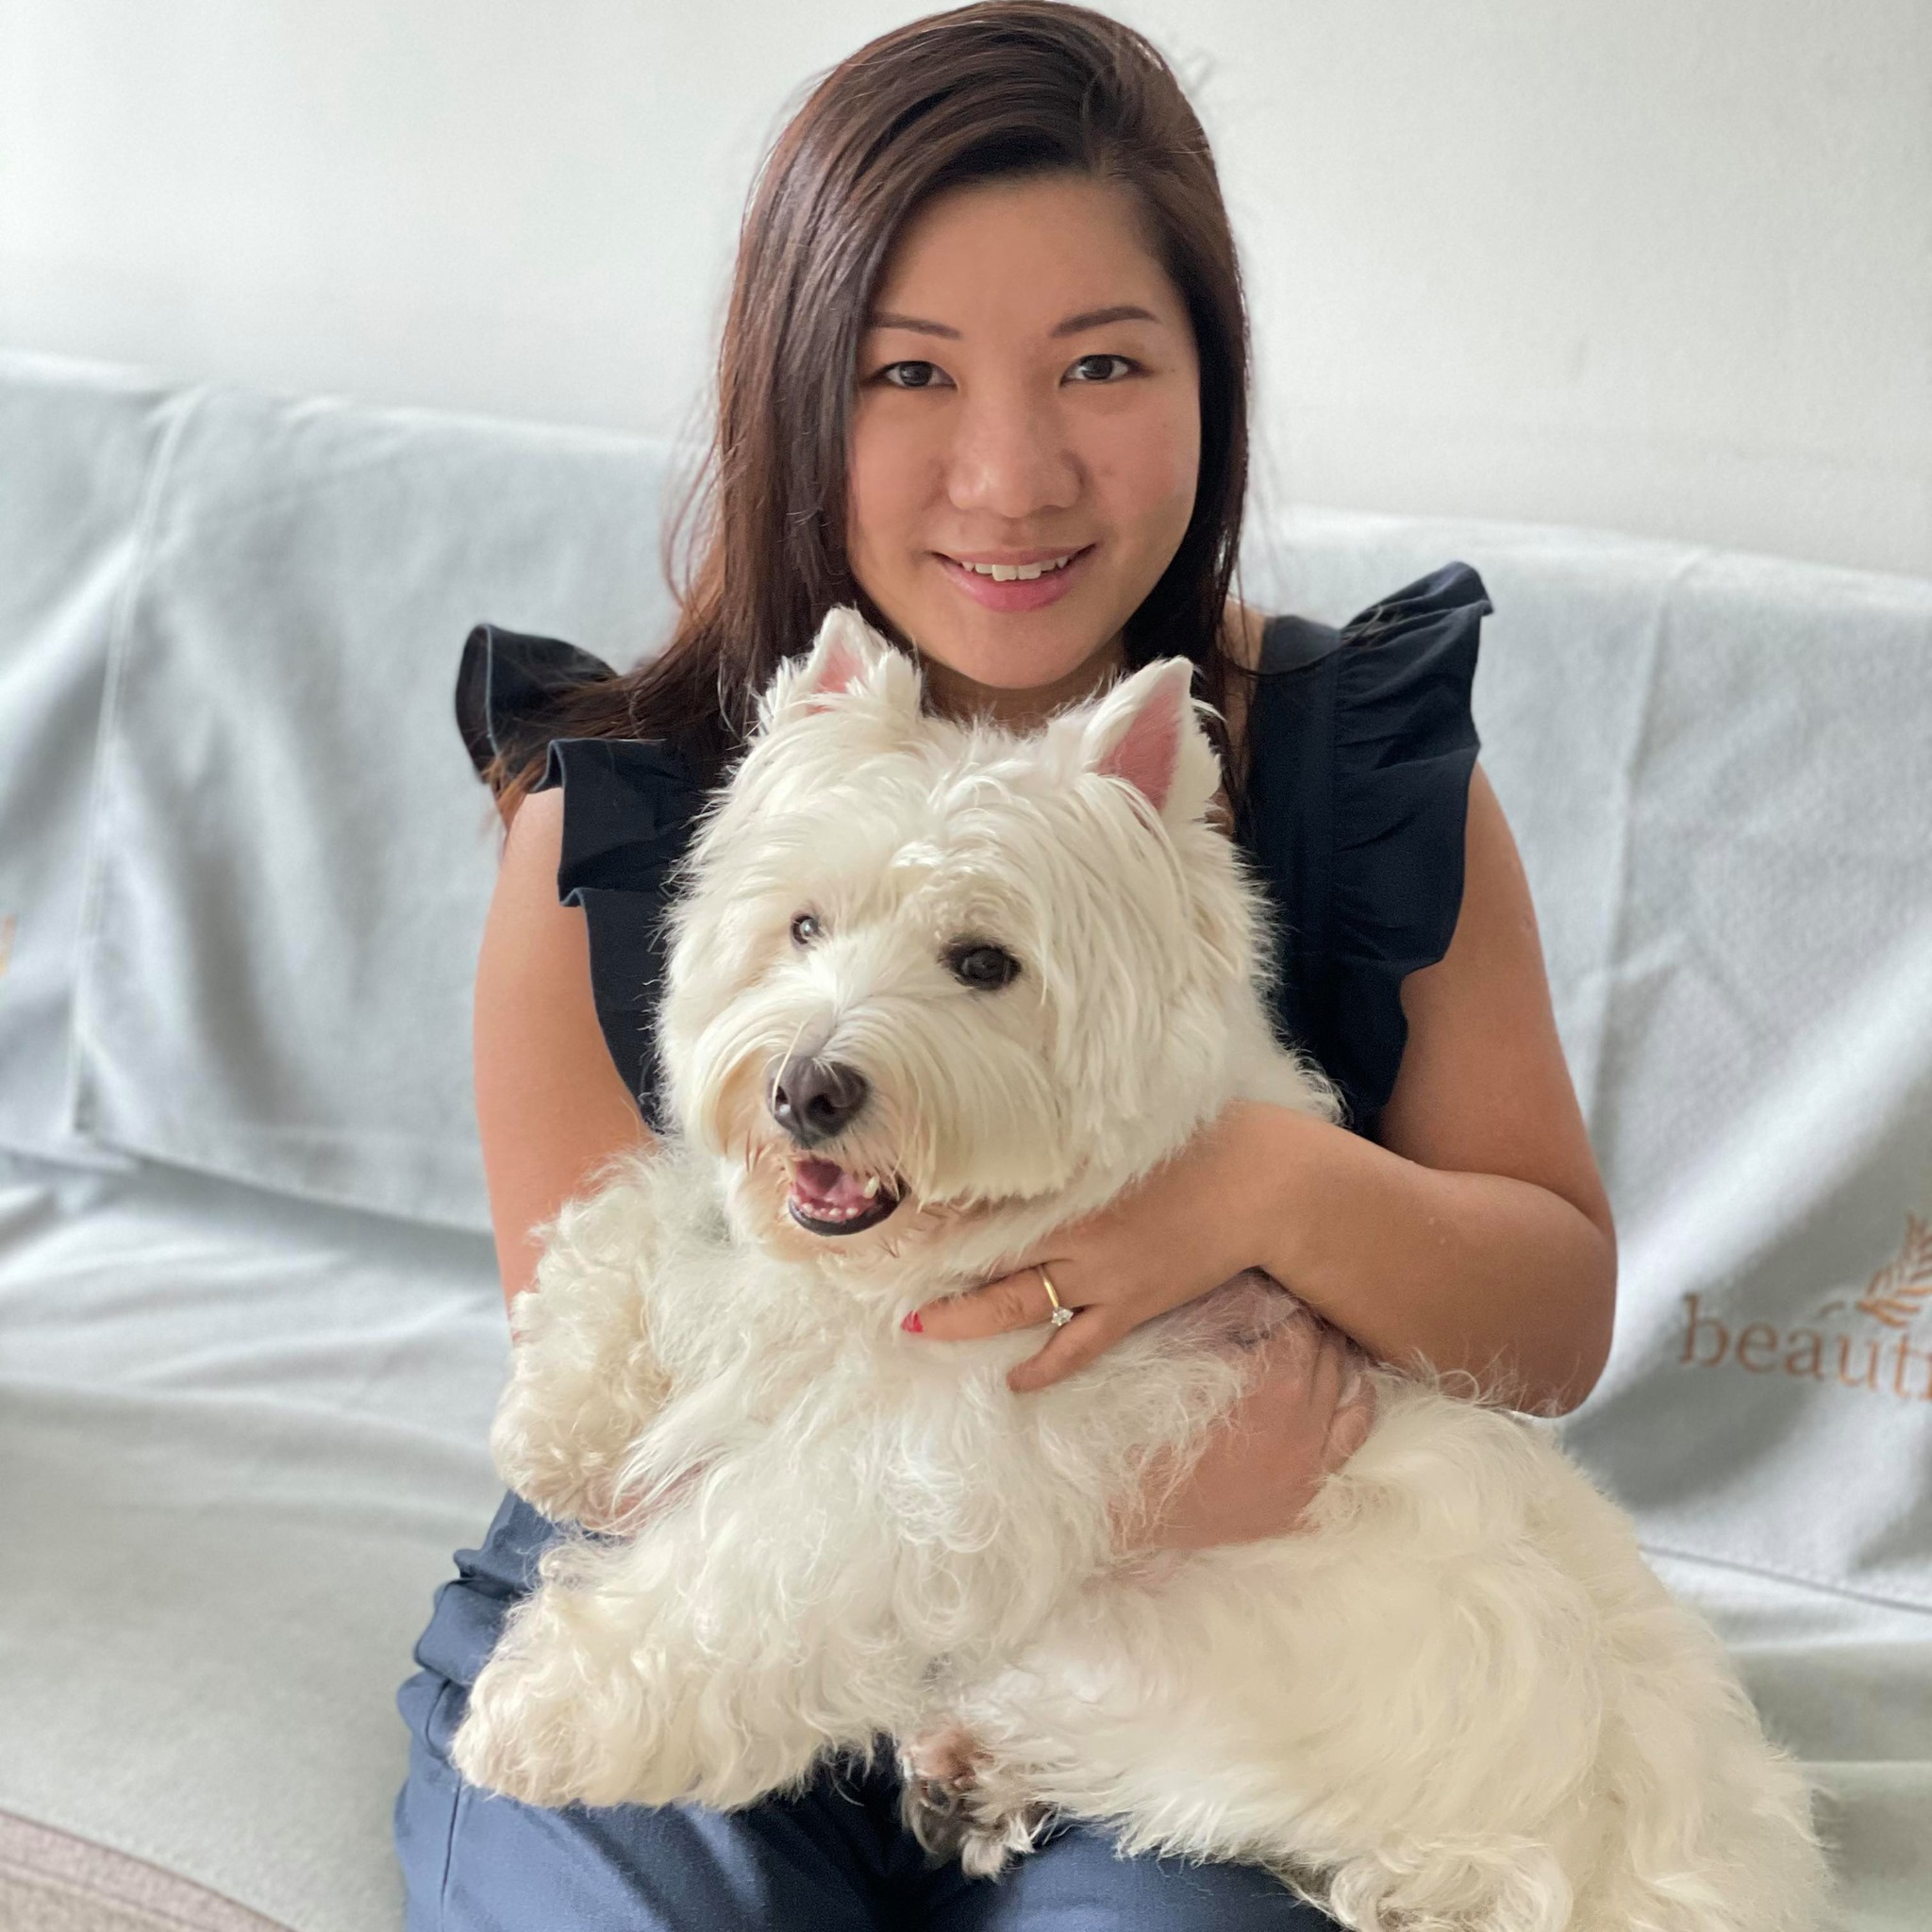 MeiLing Huang